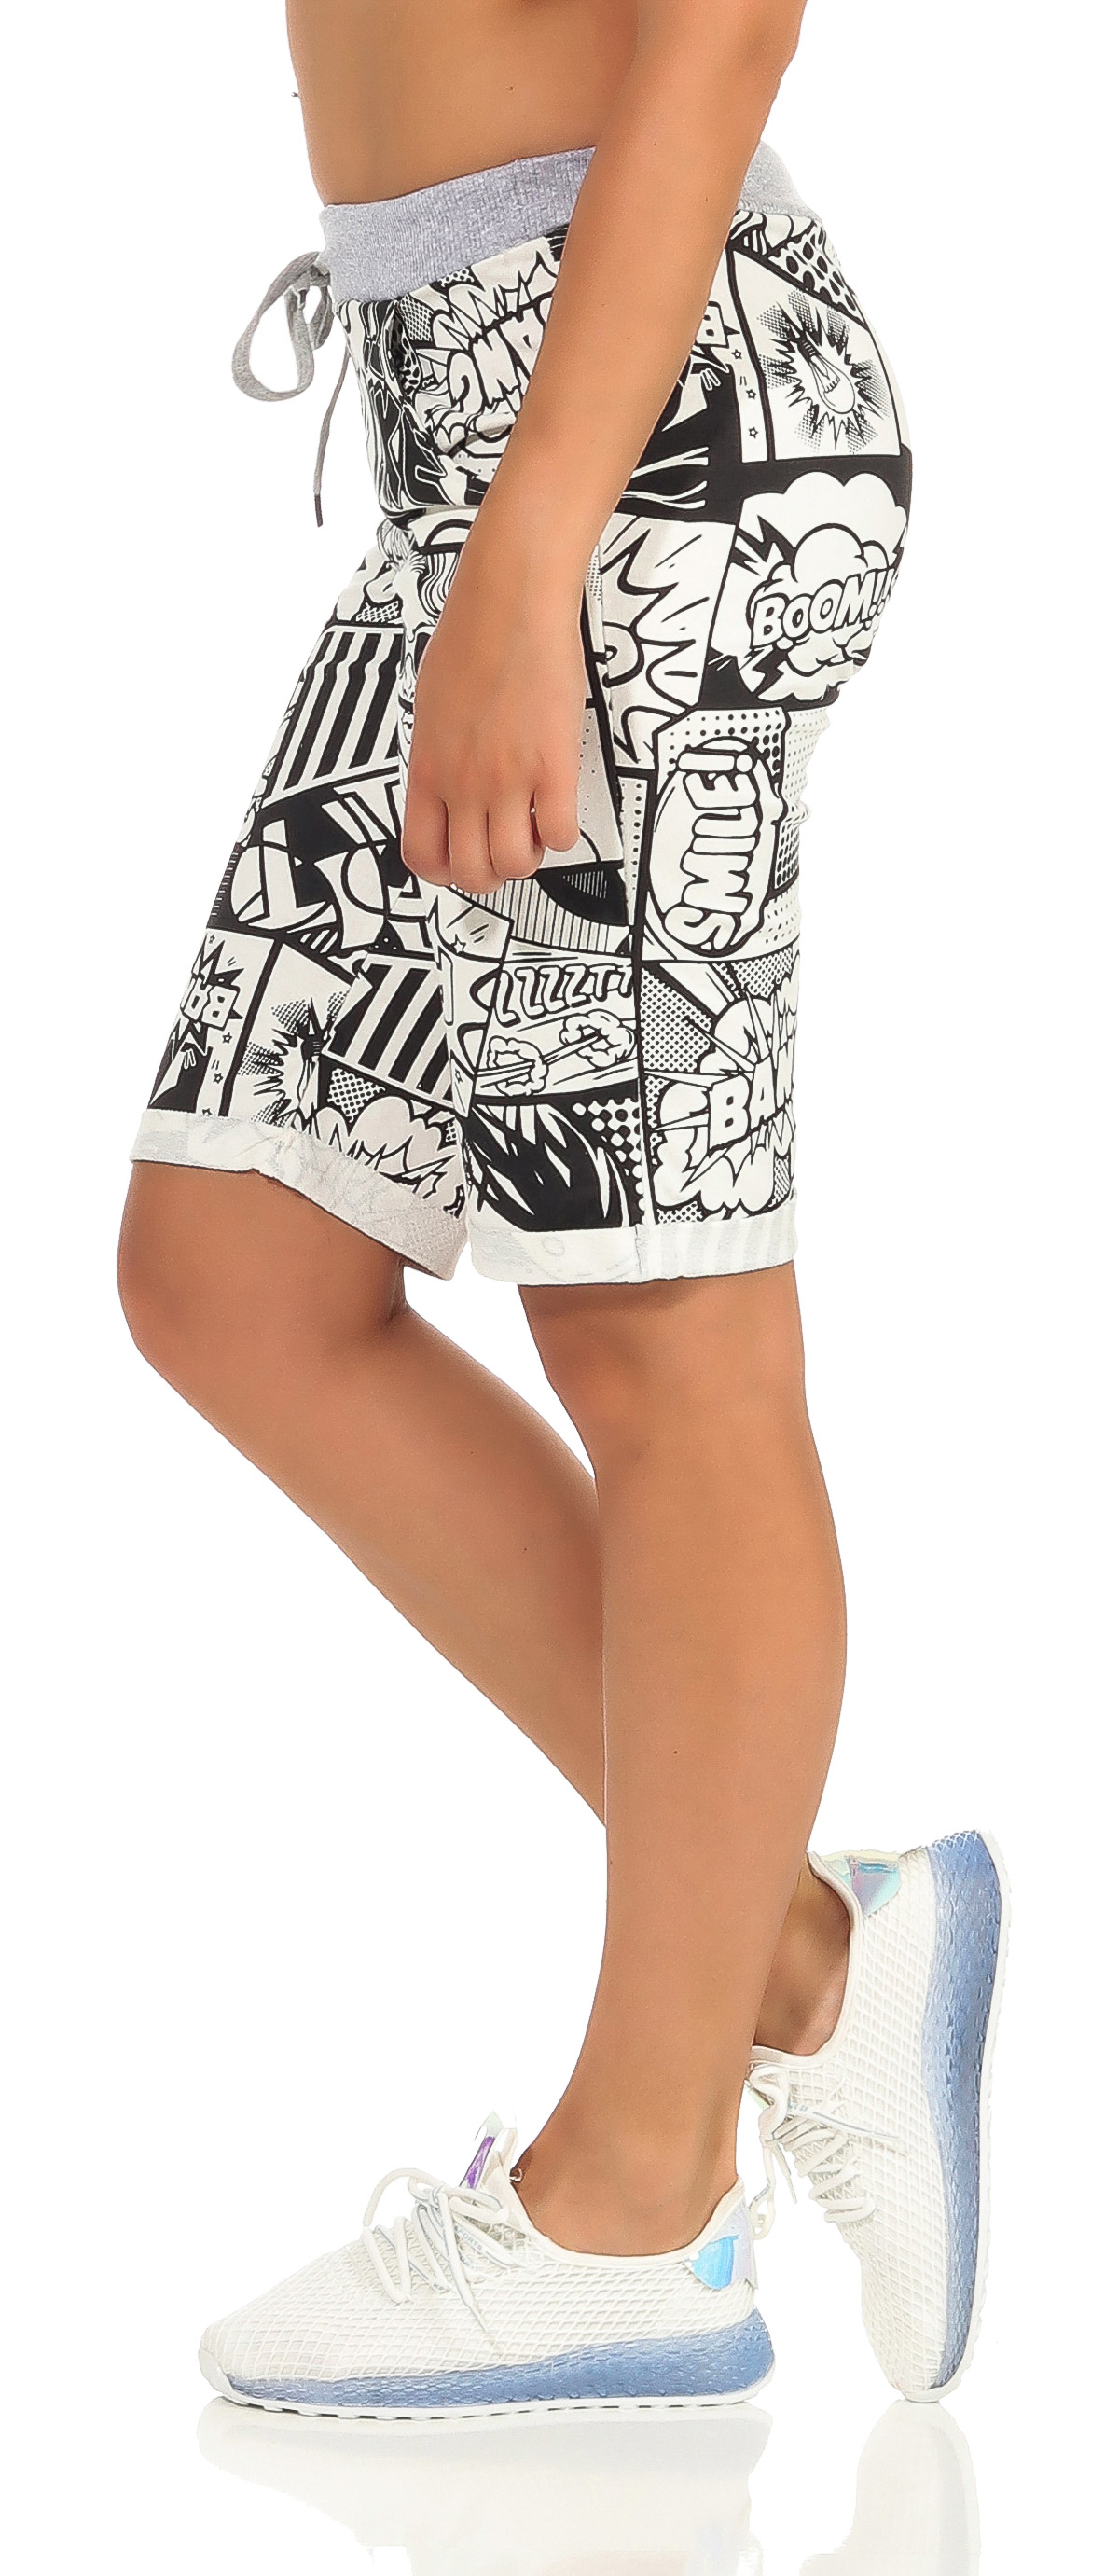 Shorts Damen Bermuda Sommer Hose Capri kurze Chino Stoffhose Fitness Jogging